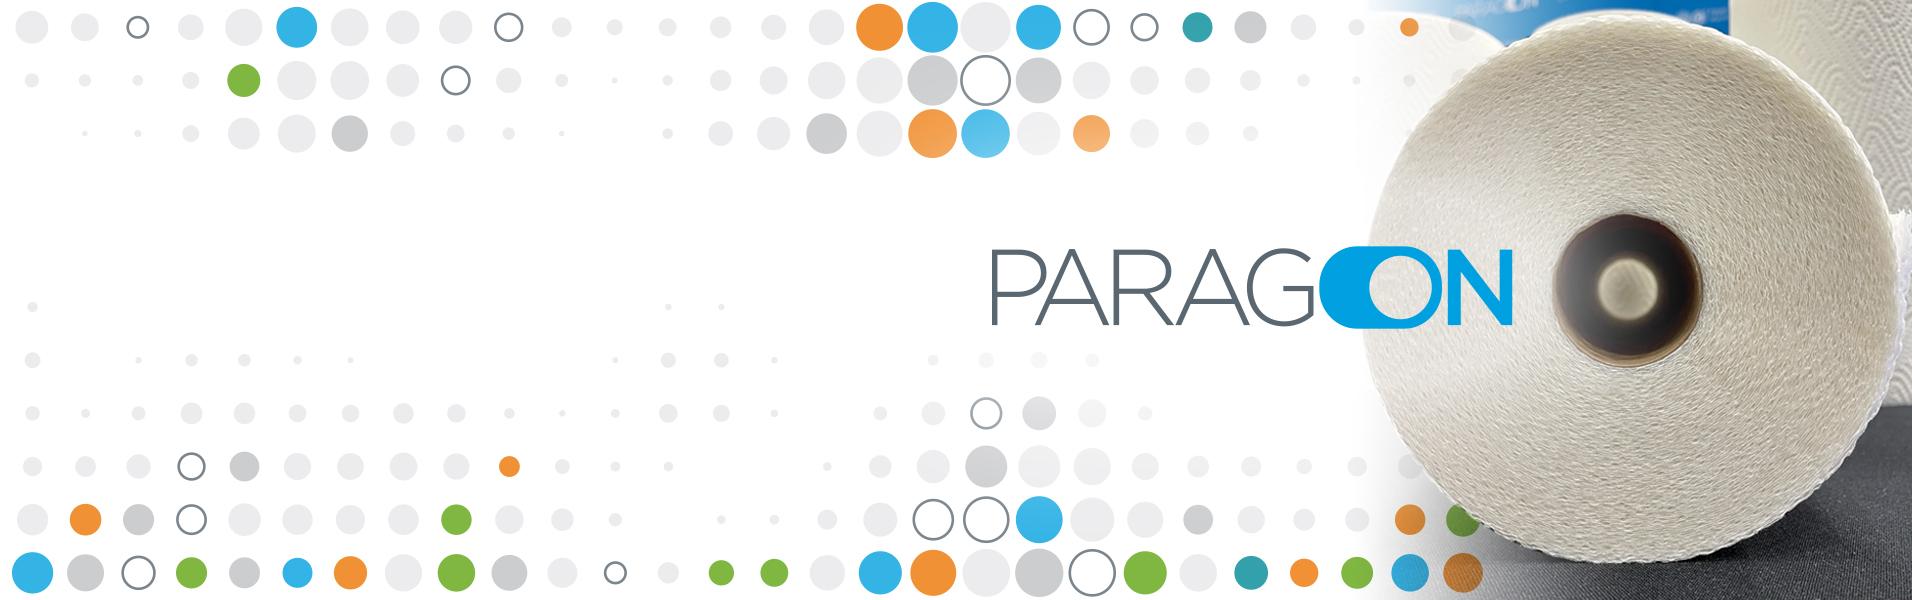 PCMC-2139 Website Home Sliders_Paragon no text